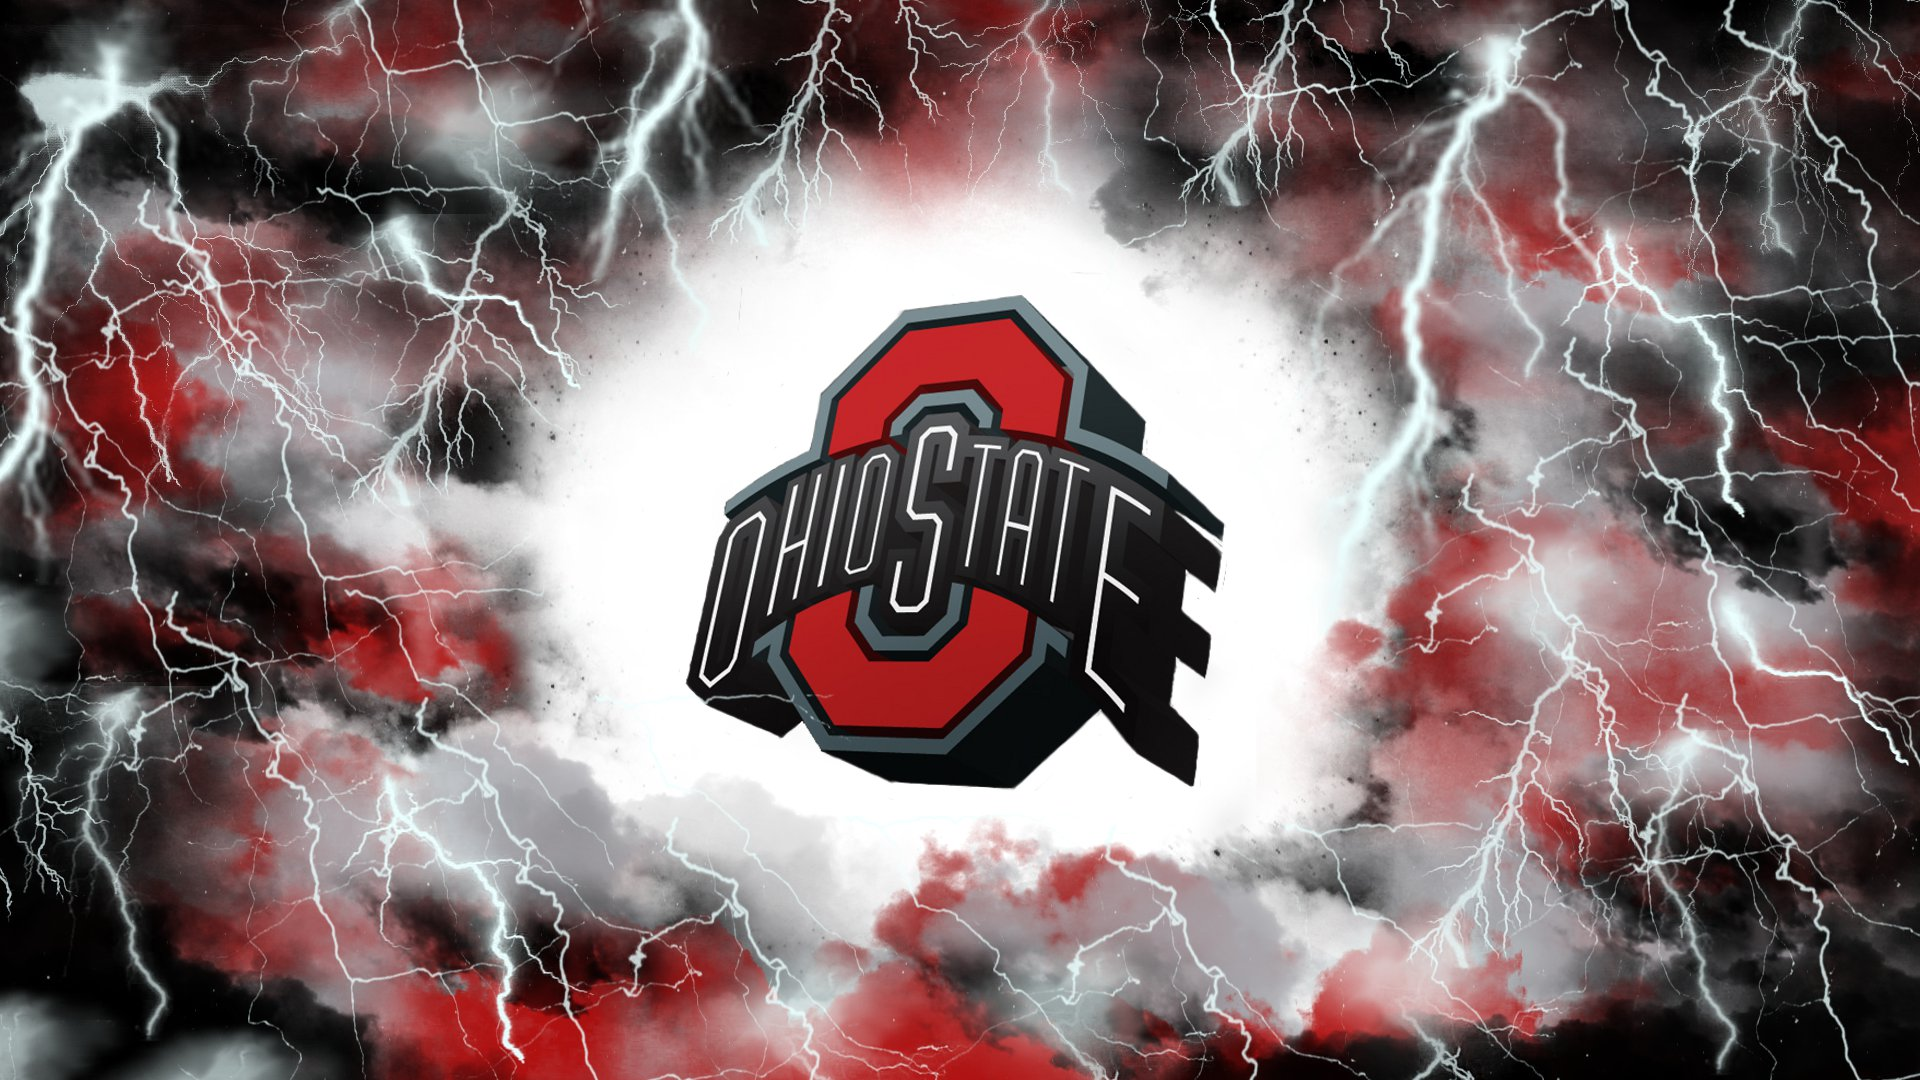 OHIO STATE BUCKEYES college football (21) wallpaper background